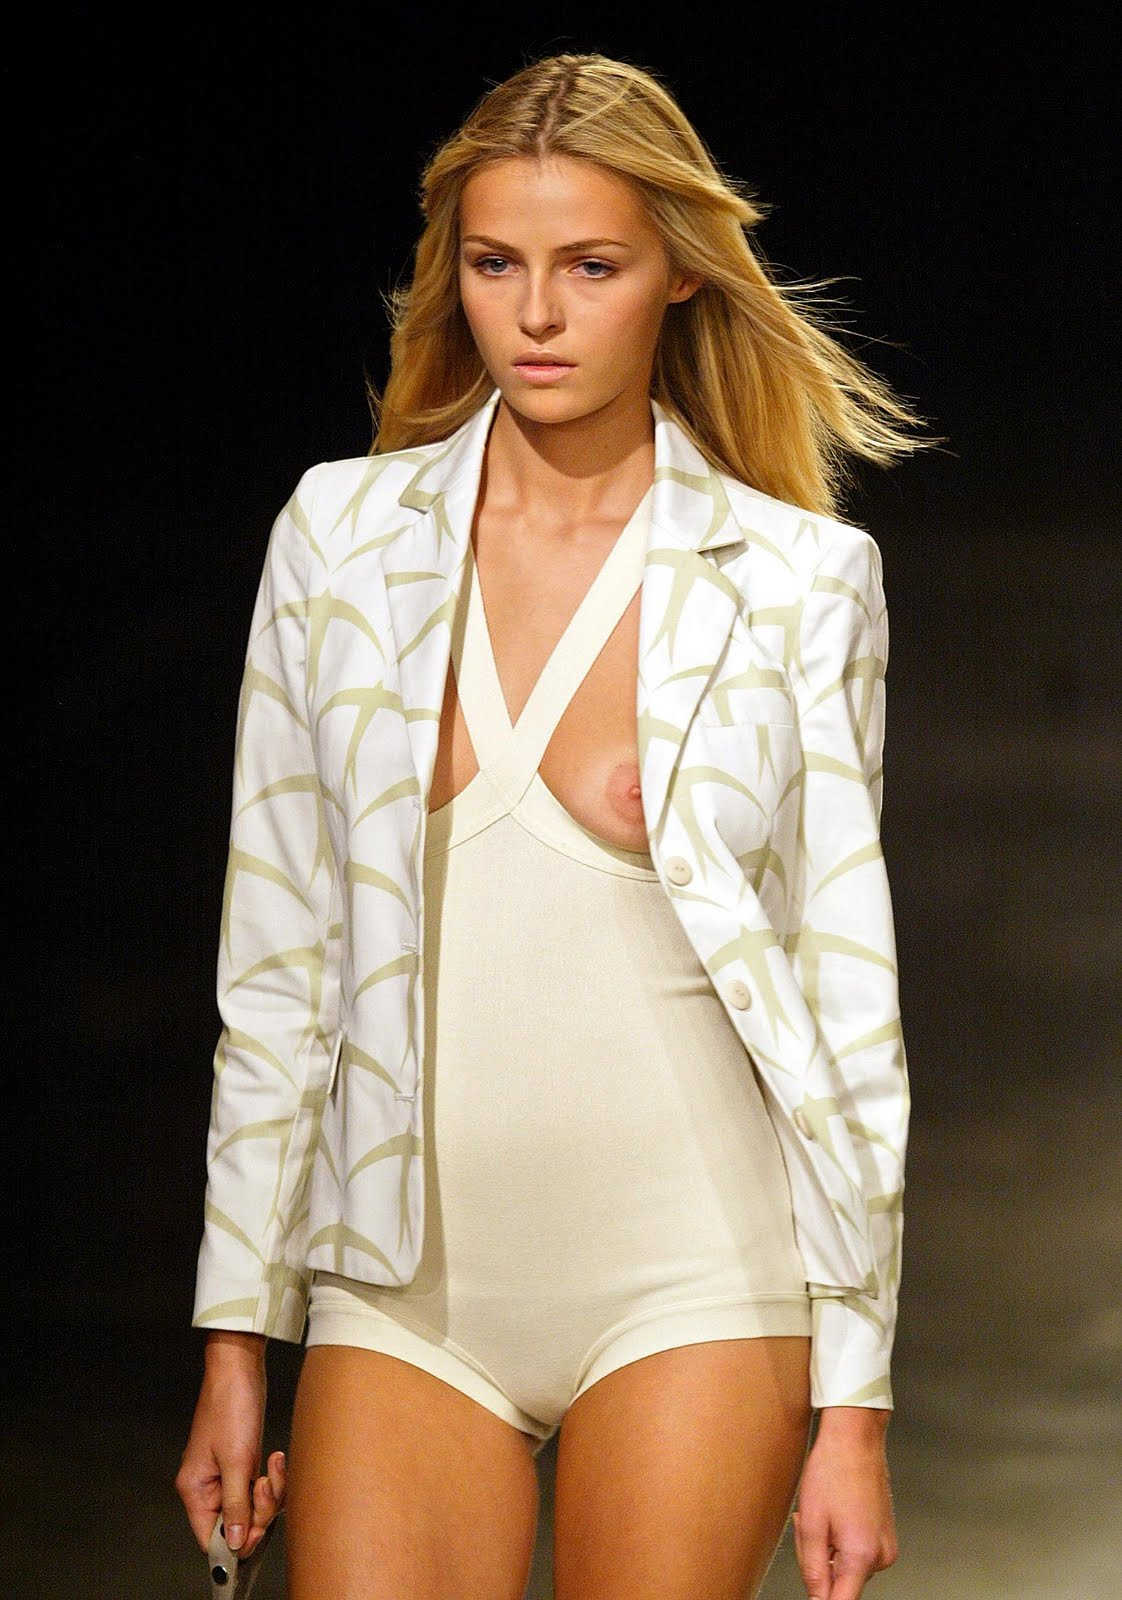 Fashion runway models nip slip